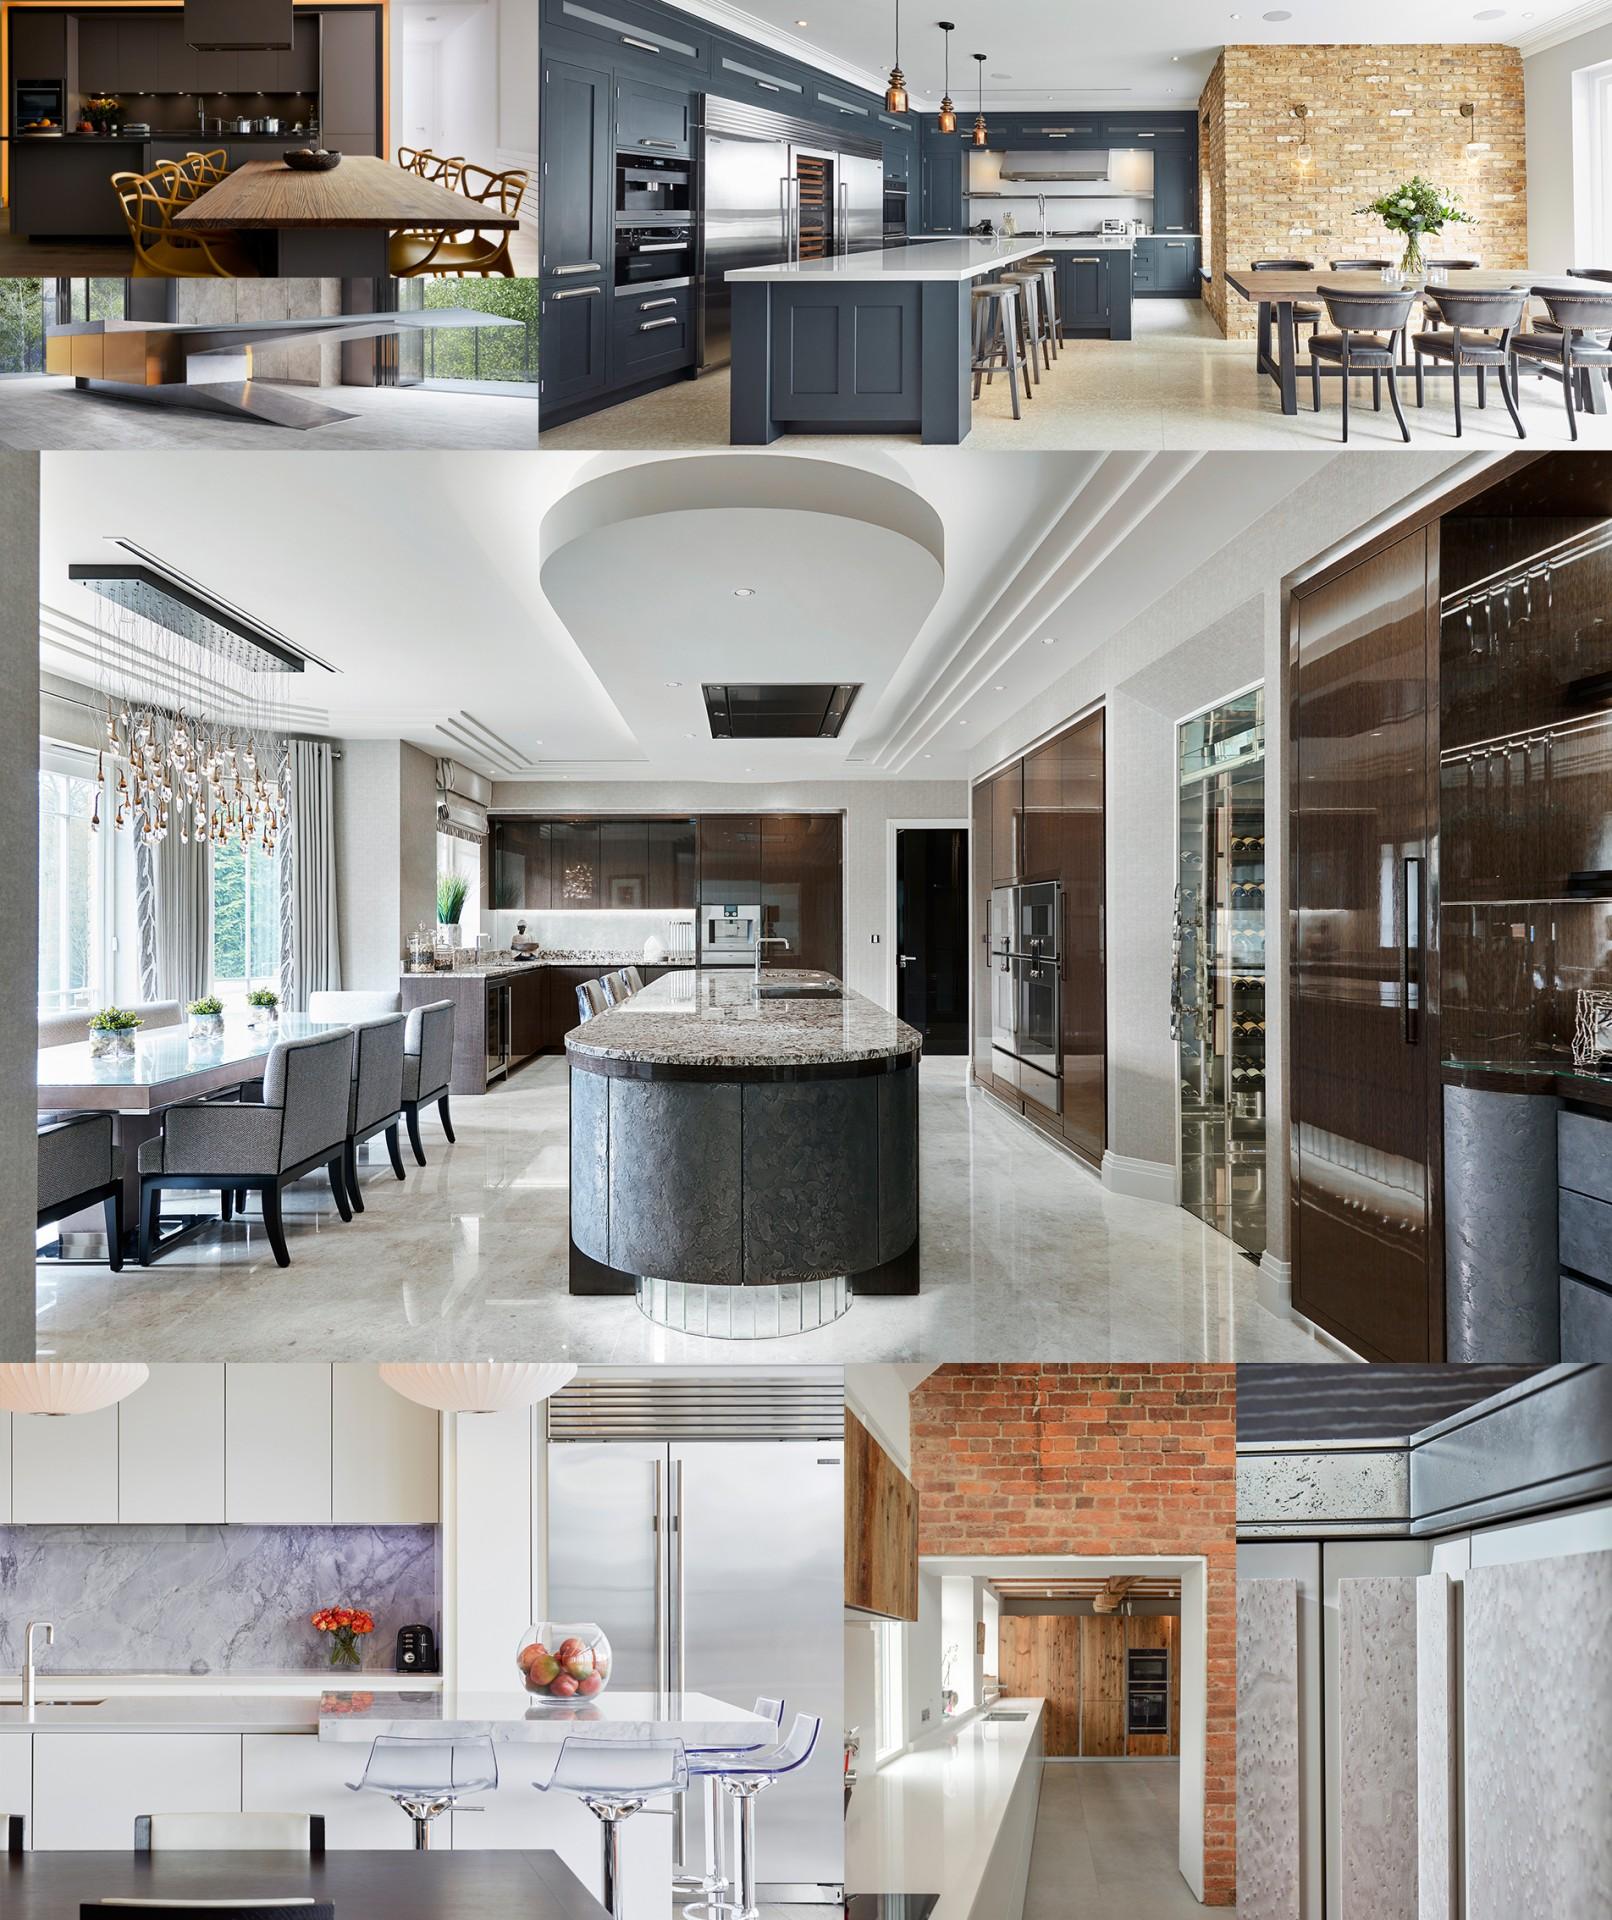 Bespoke Kitchen Designs Uk: Luxury Bespoke Kitchens